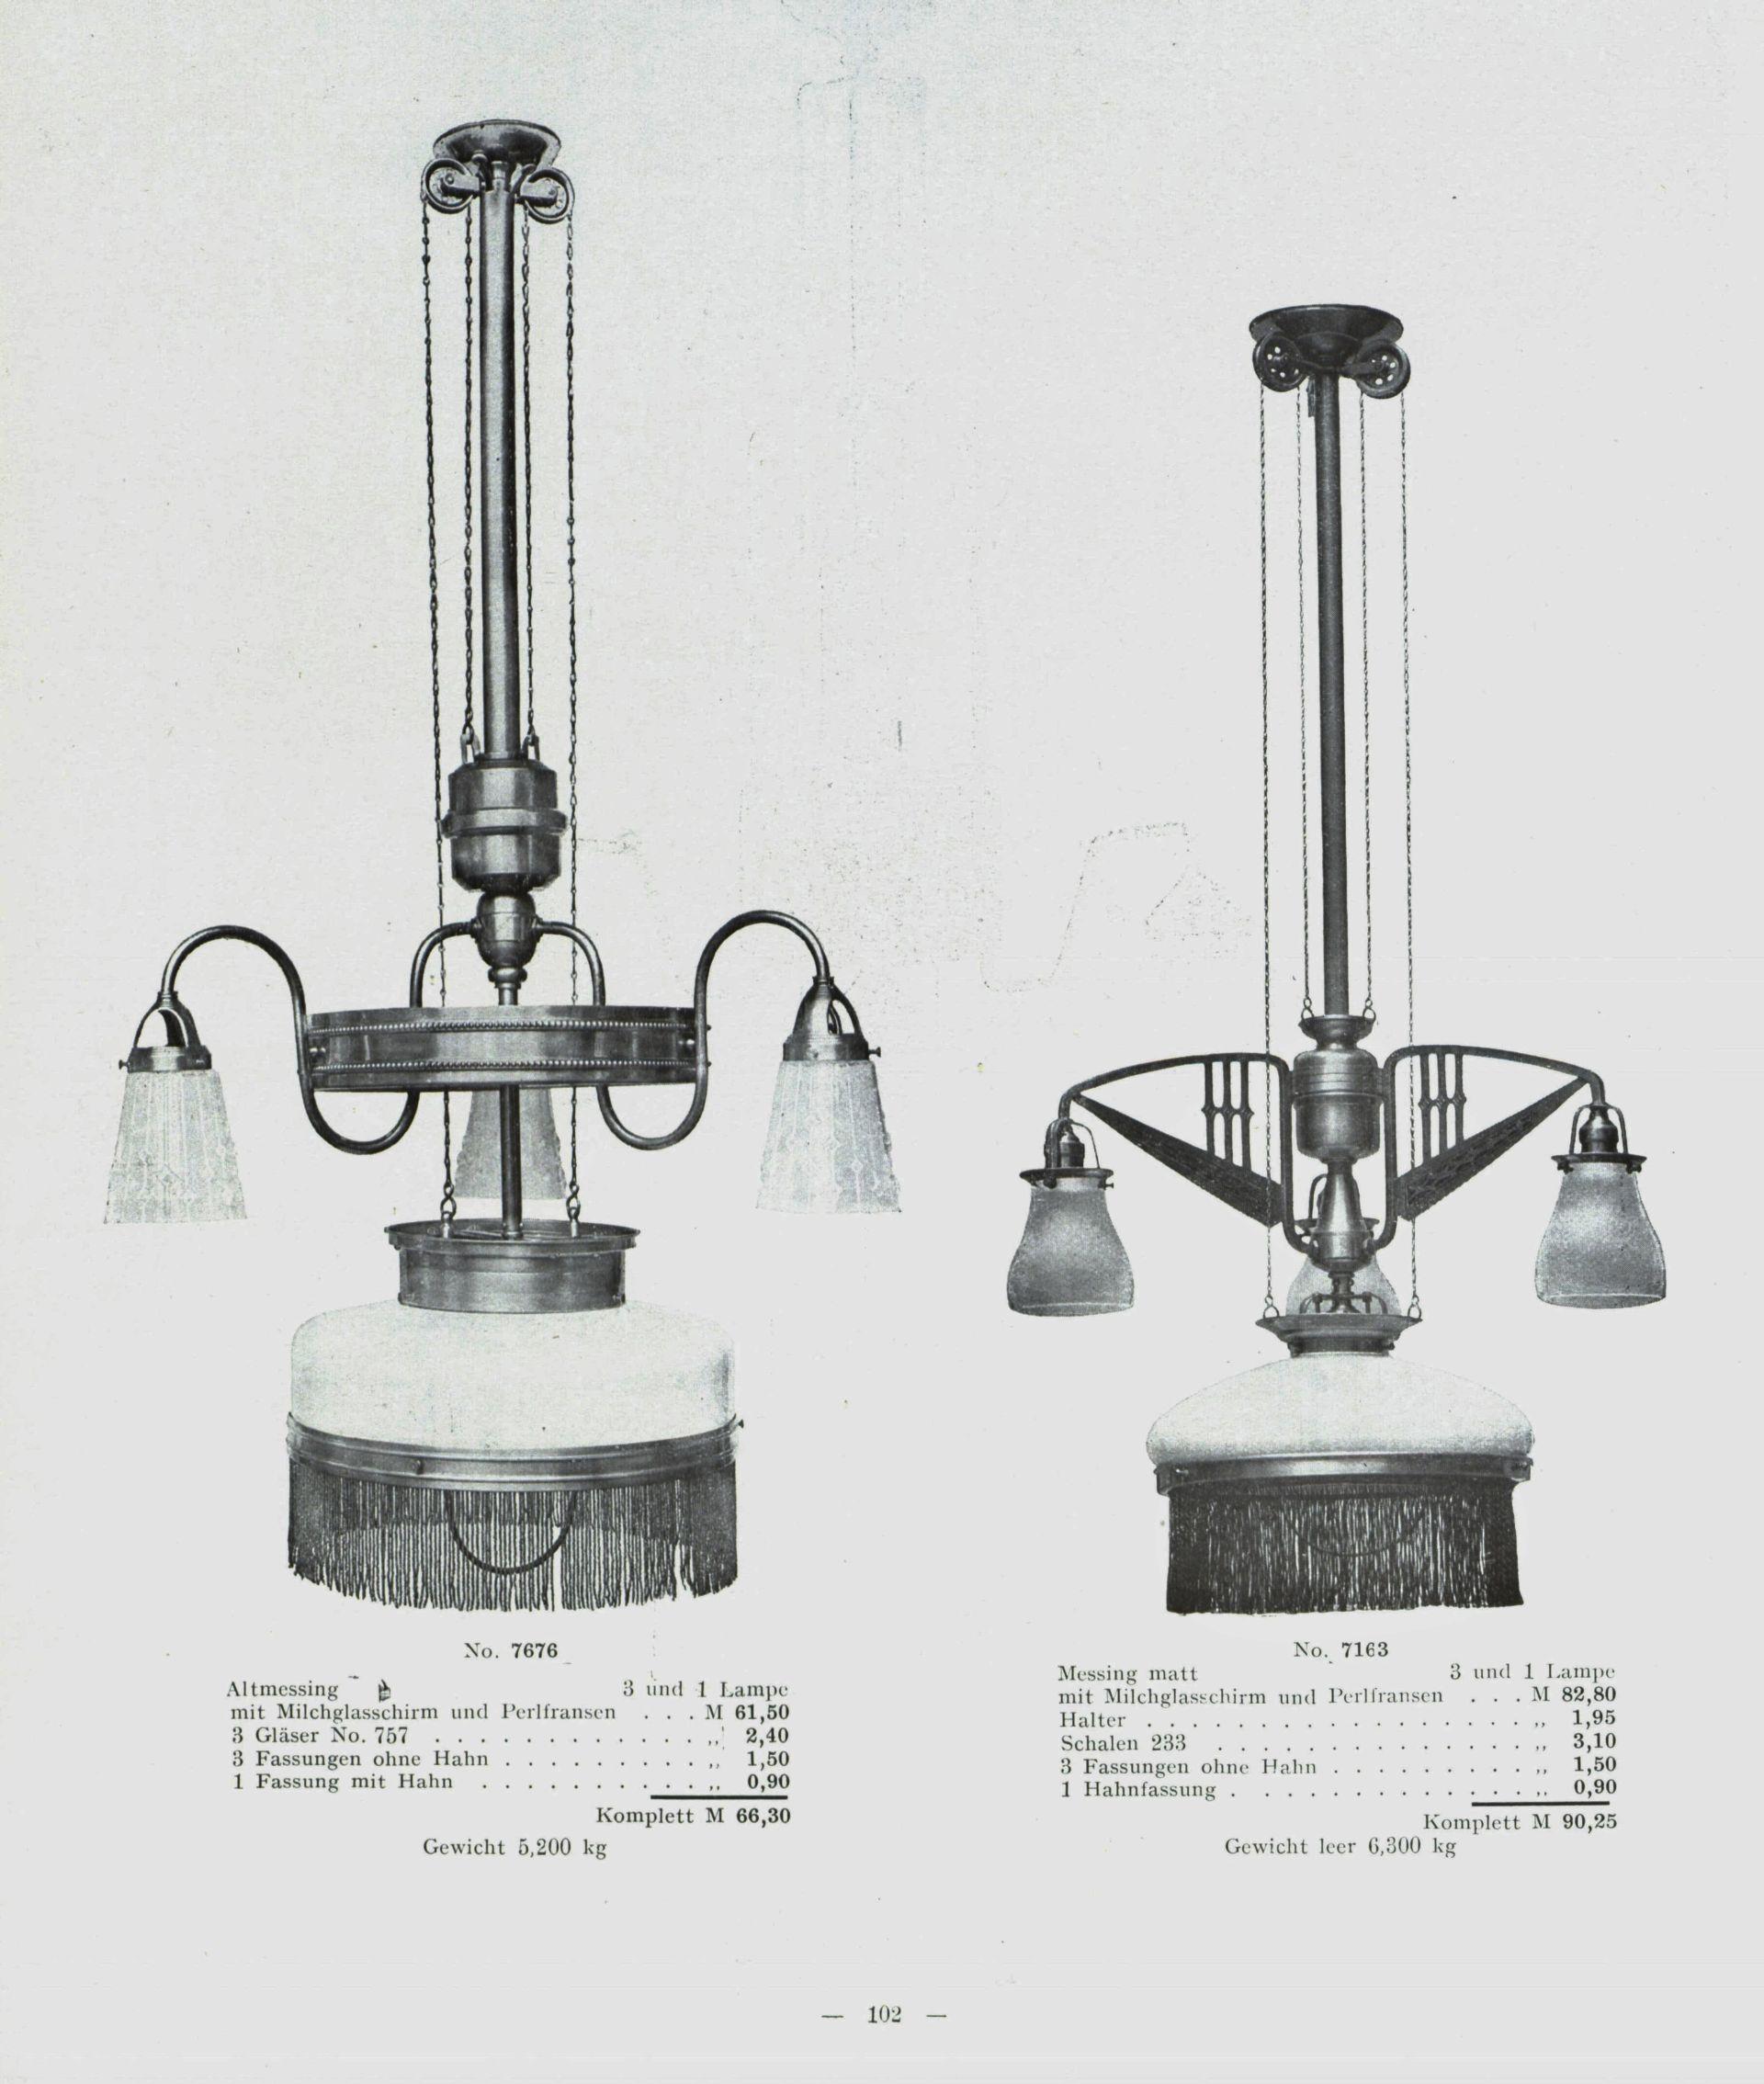 Chandeliers from the catalogue Beleuchtungskörper GmbH, t. 1–2, Berlin, 1910, in: Lietuvos mokslų akademijos Vrublevskių biblioteka, Retų spaudinių skyrius, A851